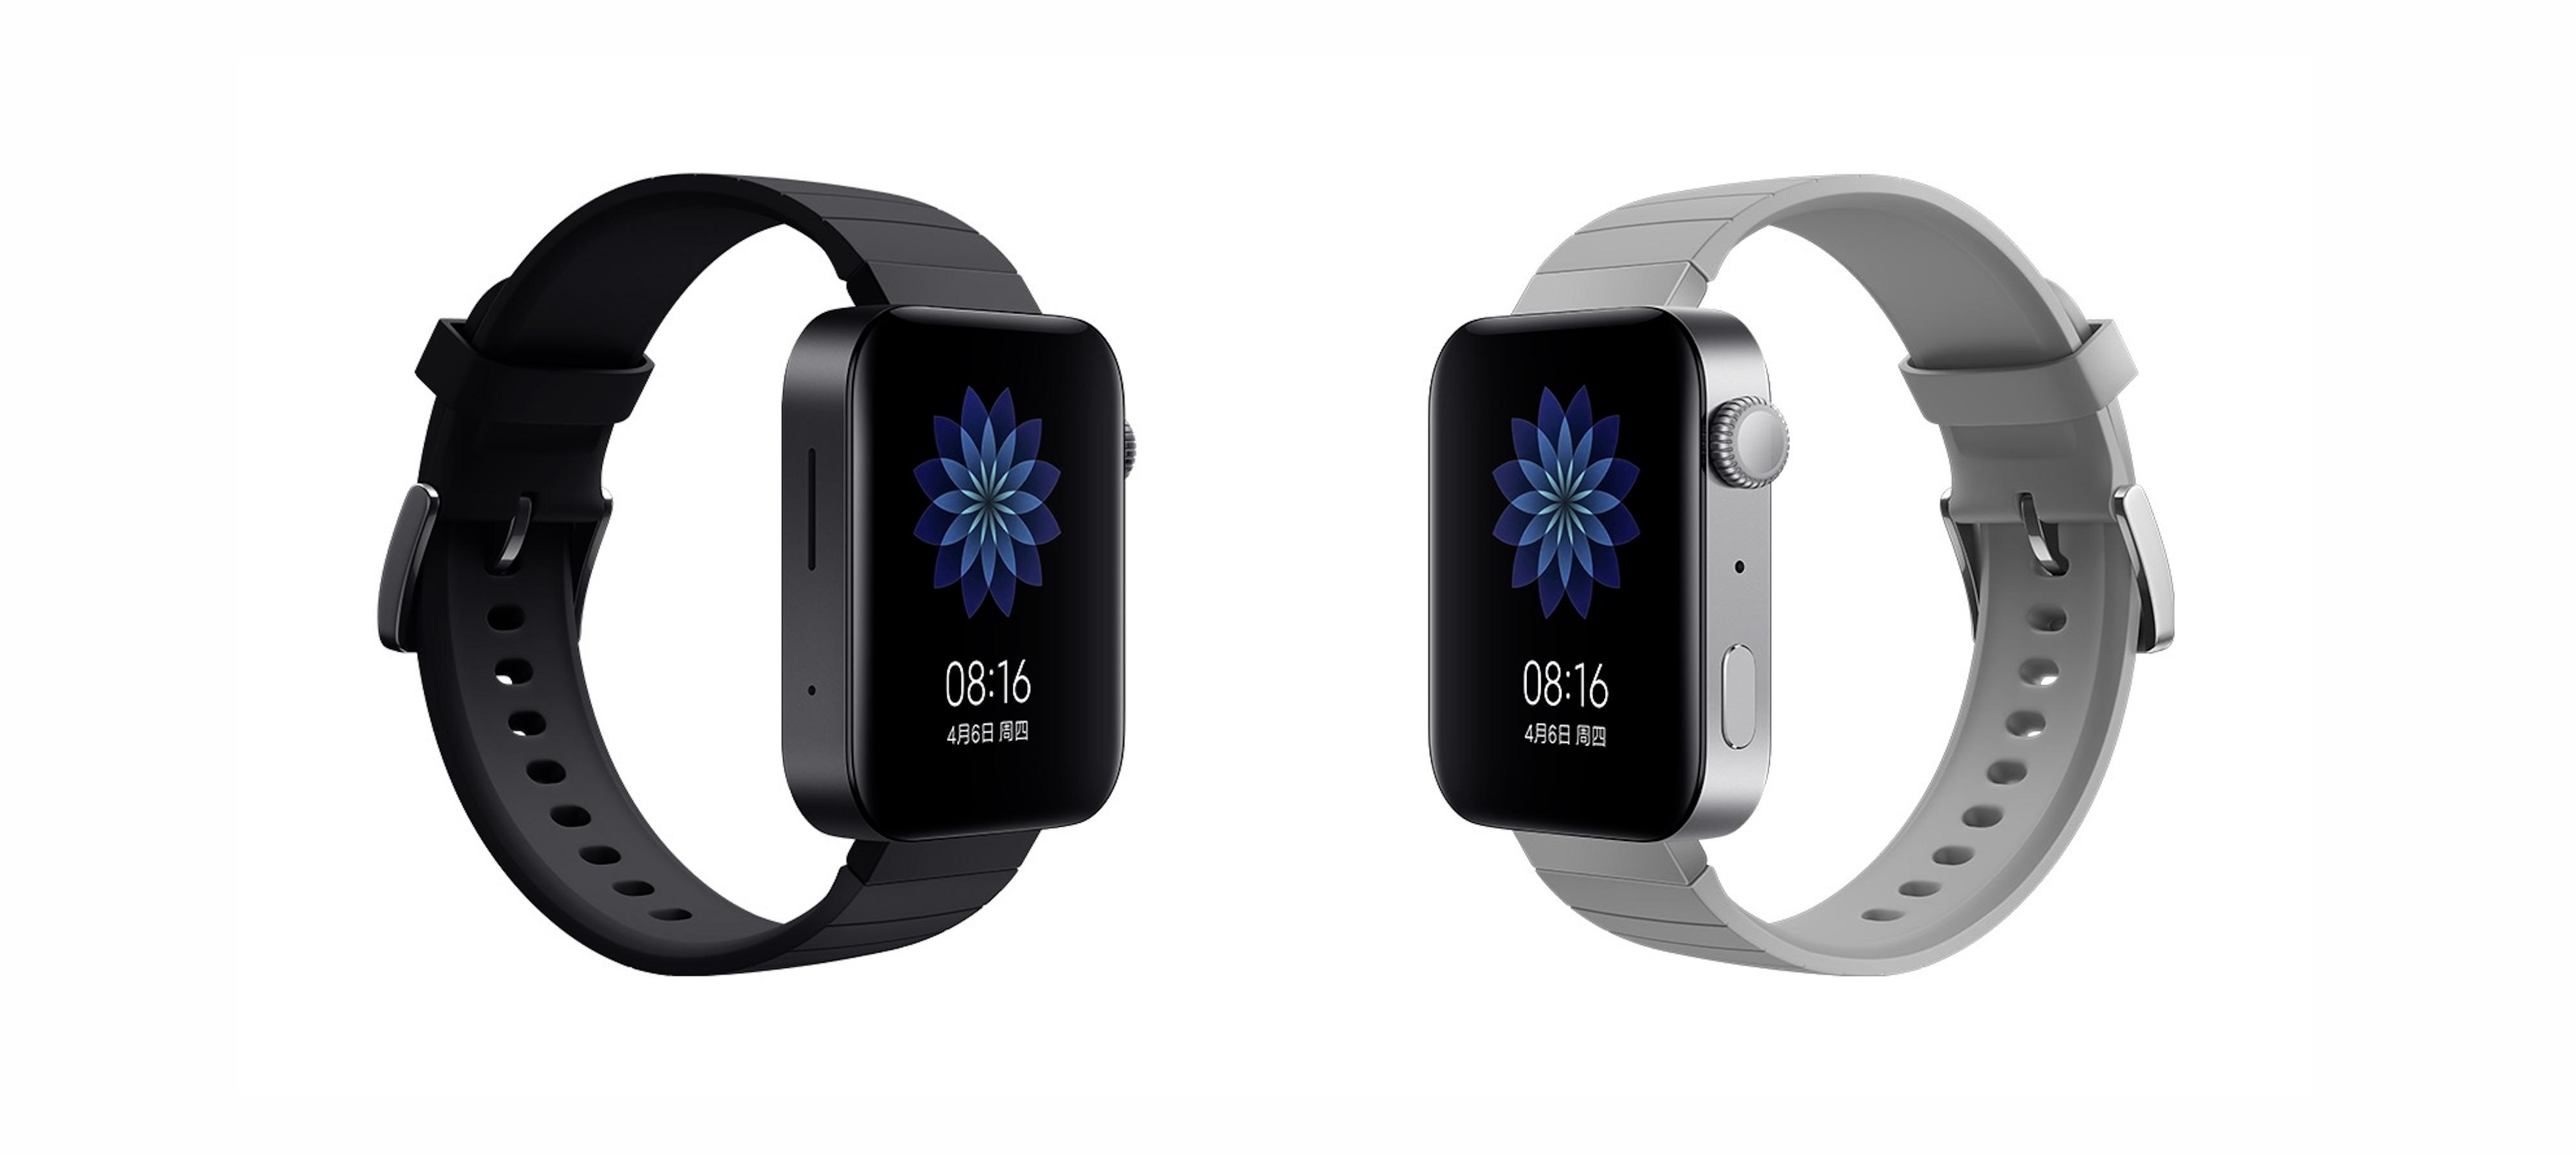 Un peu de patience, la Xiaomi Mi Watch arrive en France